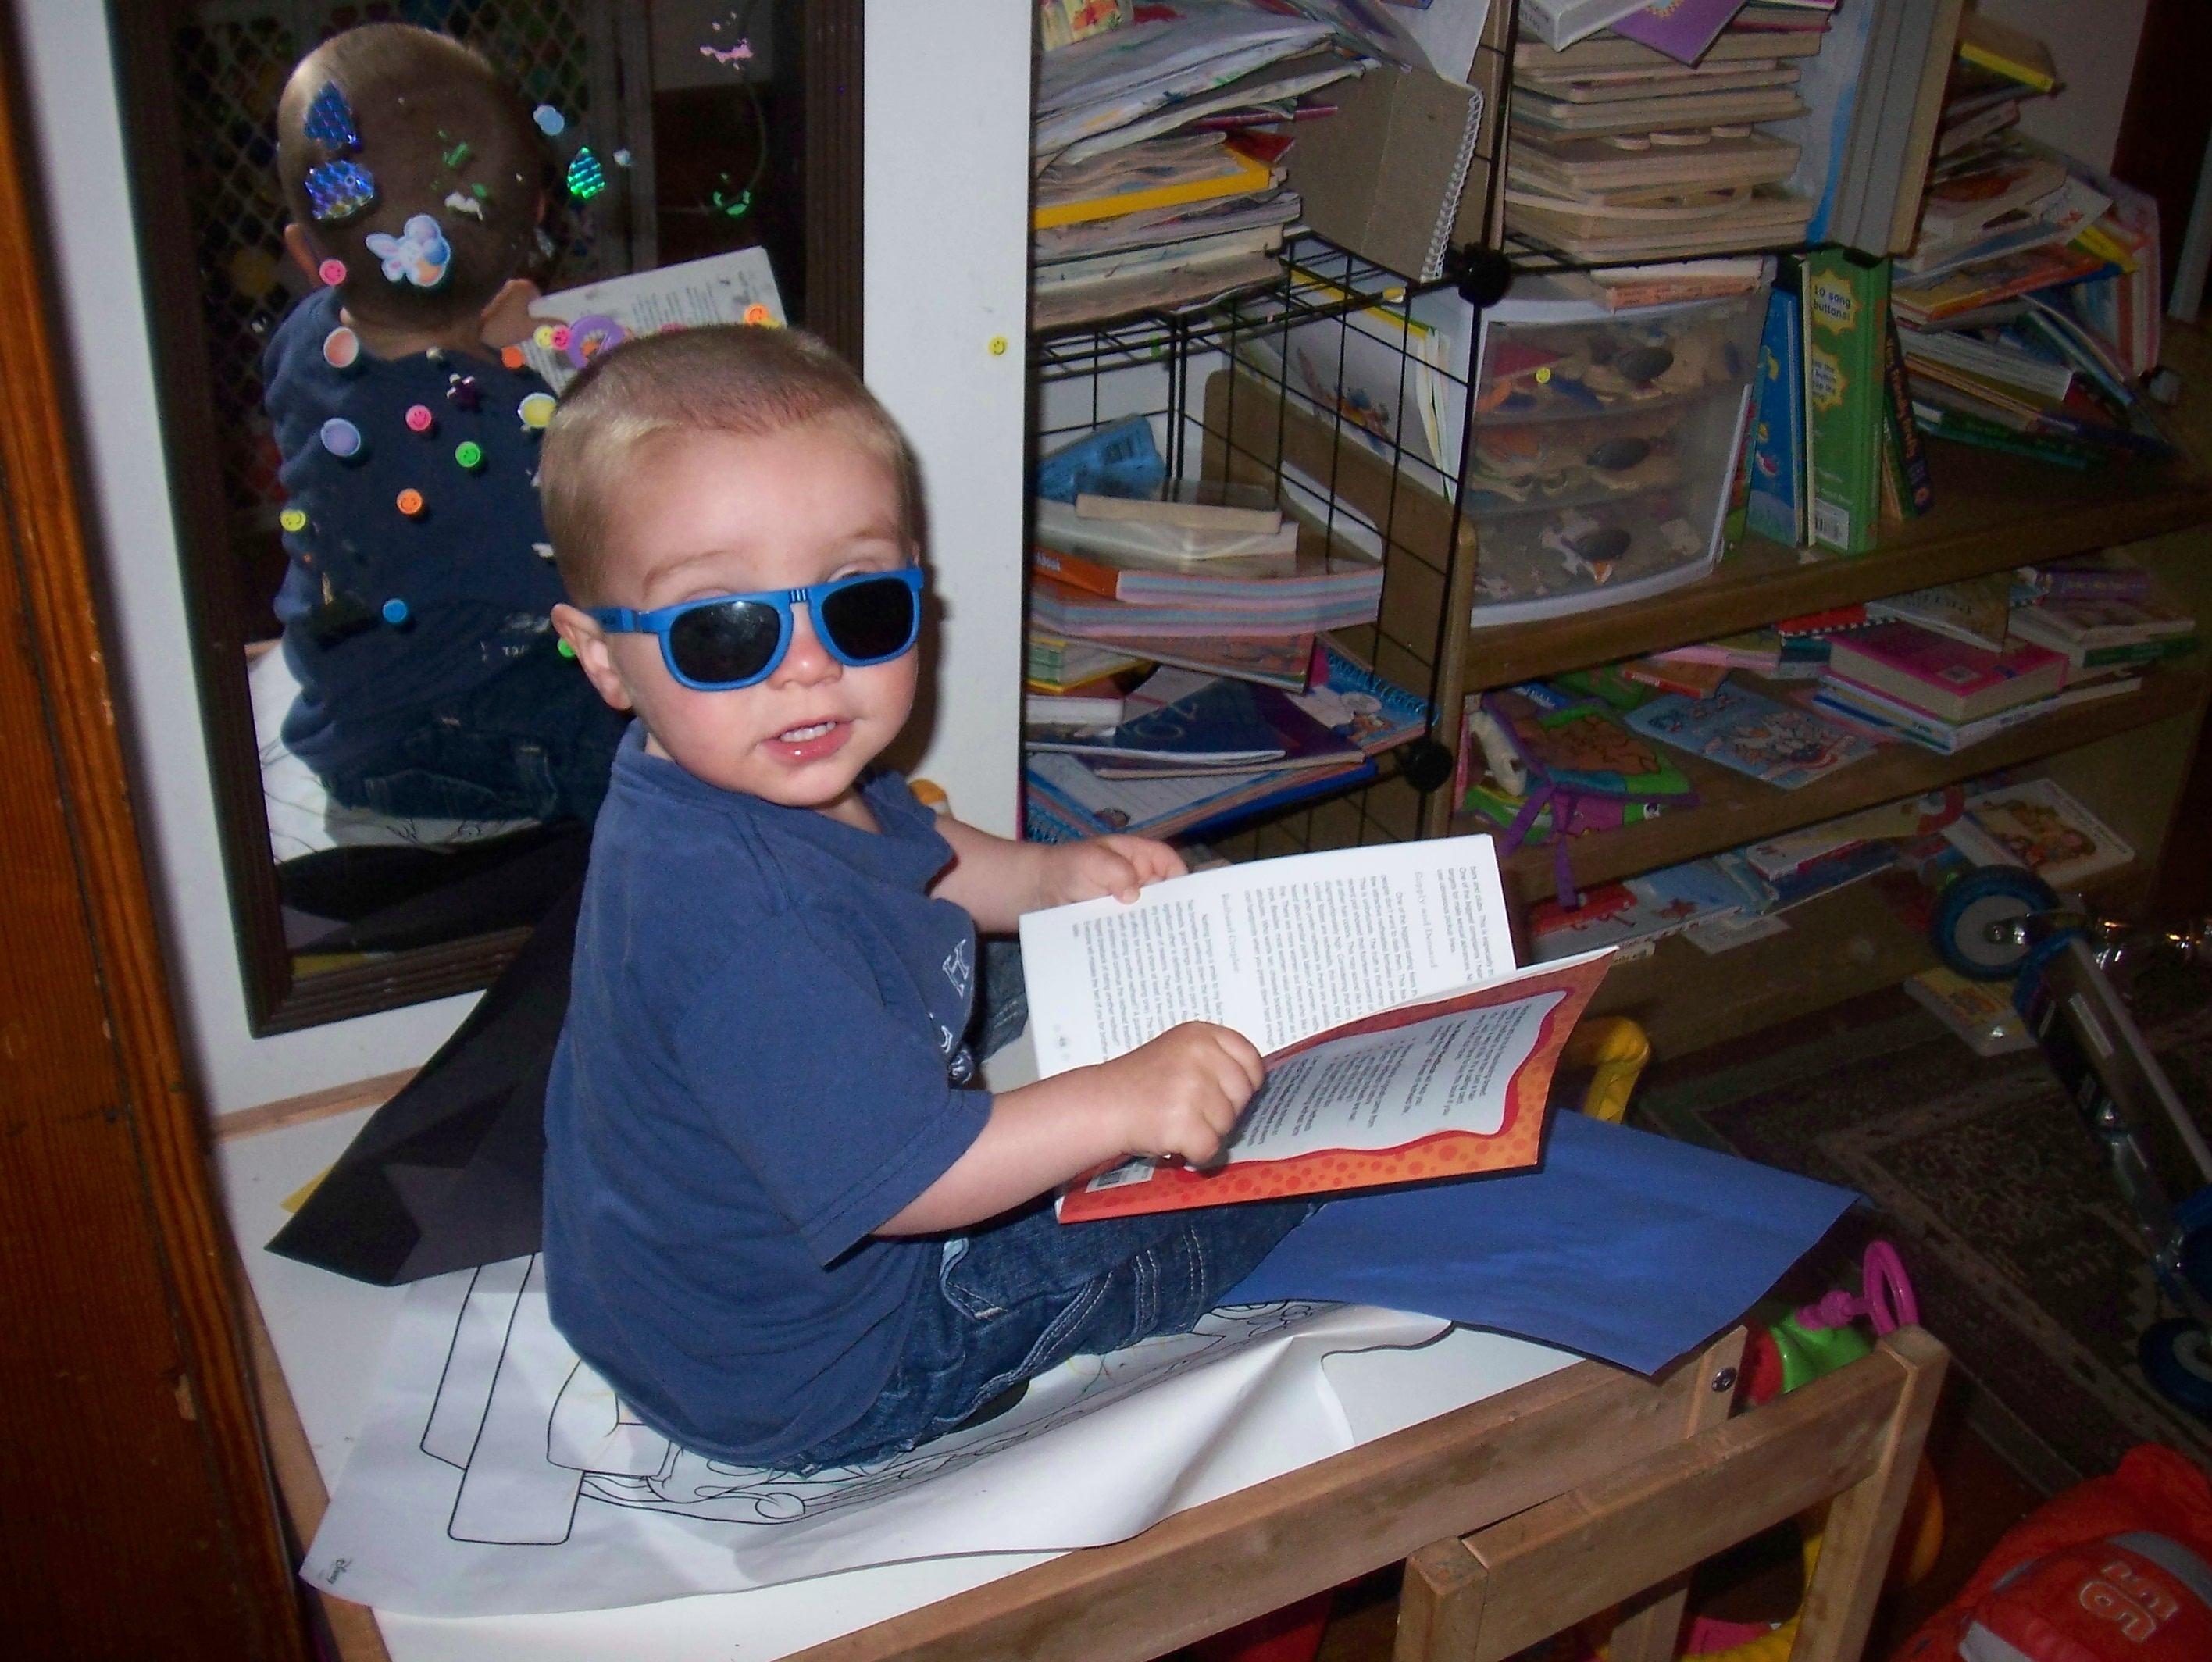 ...Even Cooler (cuz he's reading!)